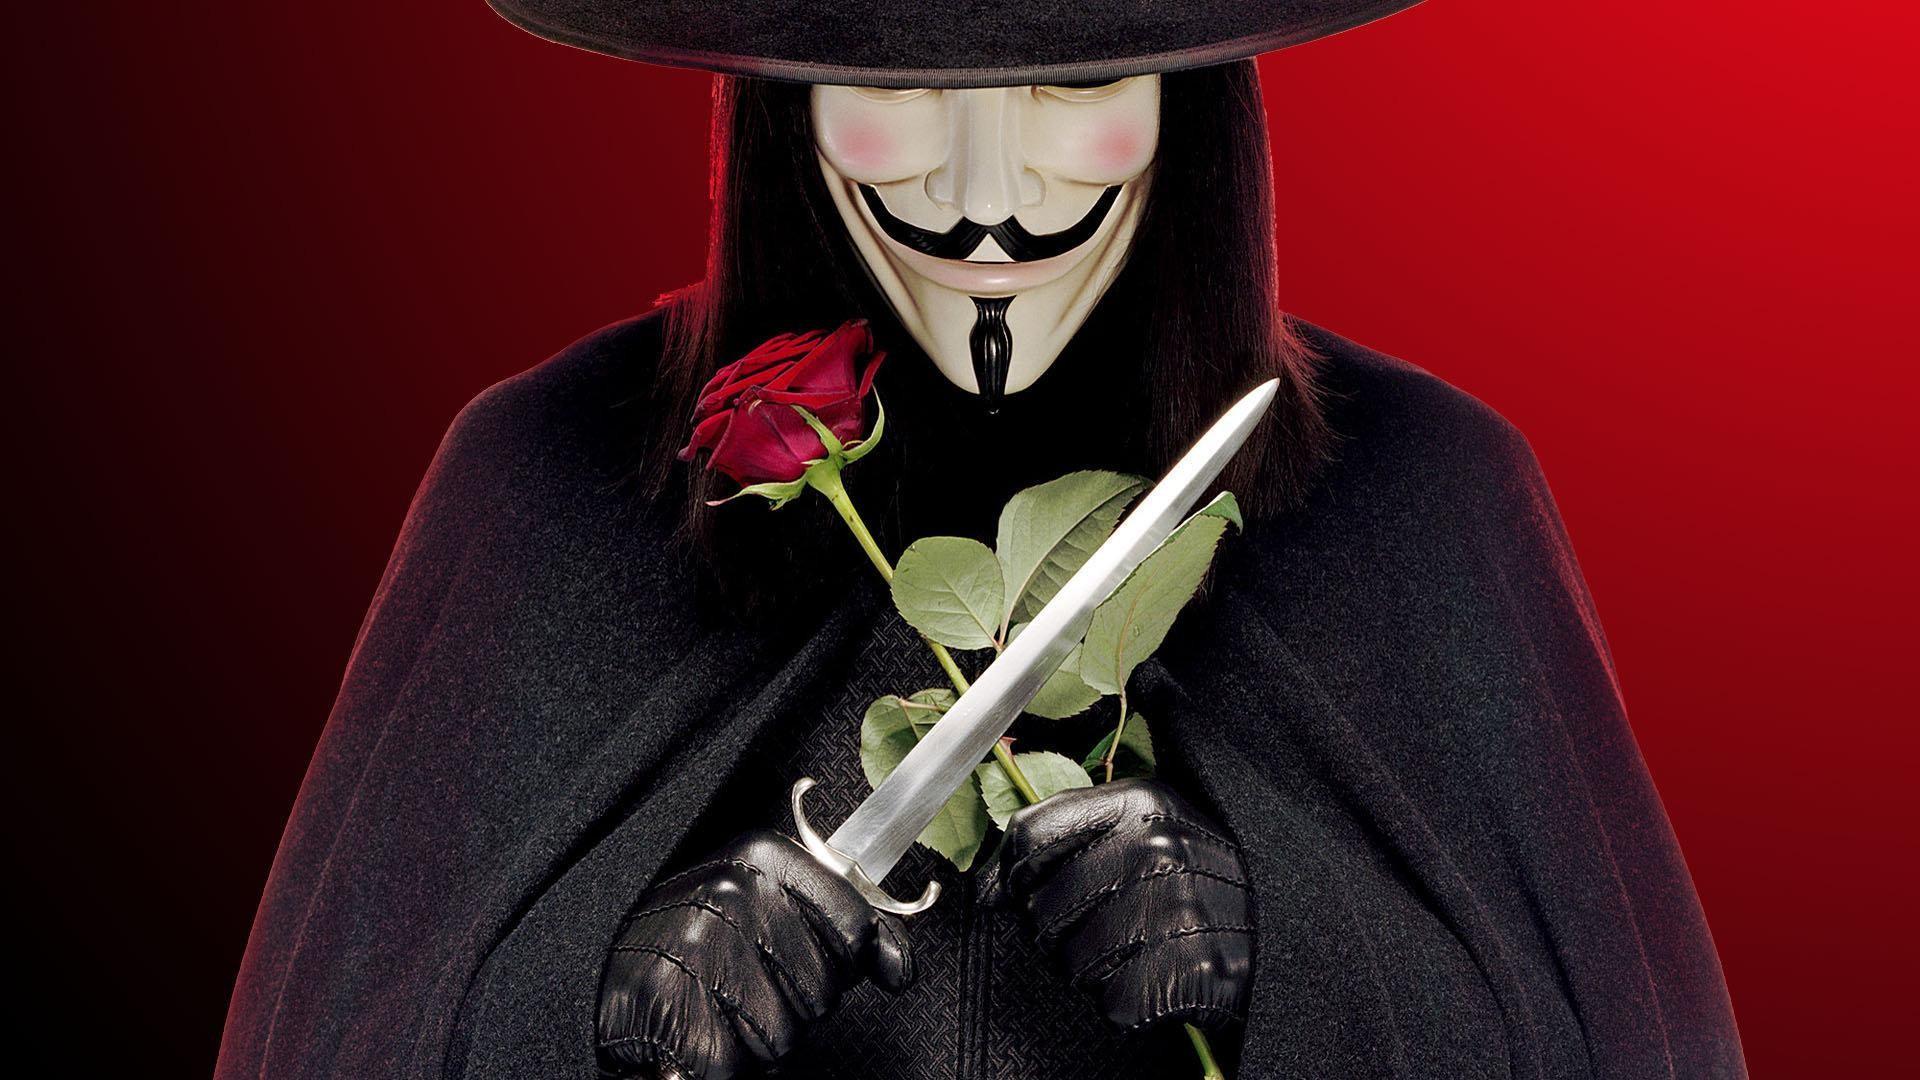 V For Vendetta download wallpaper